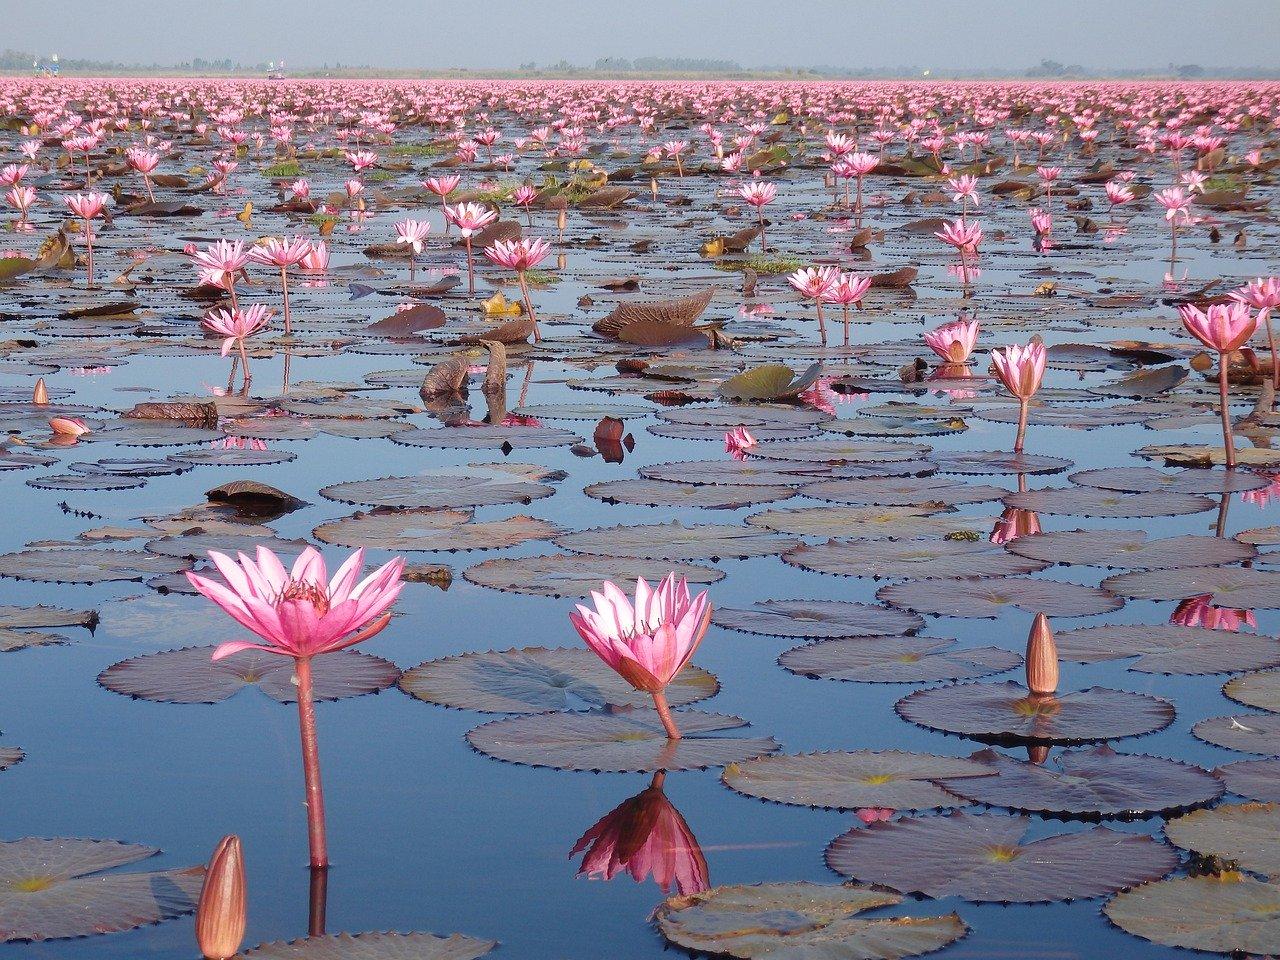 Les fleurs de Thaïlande, les espèces indigènes